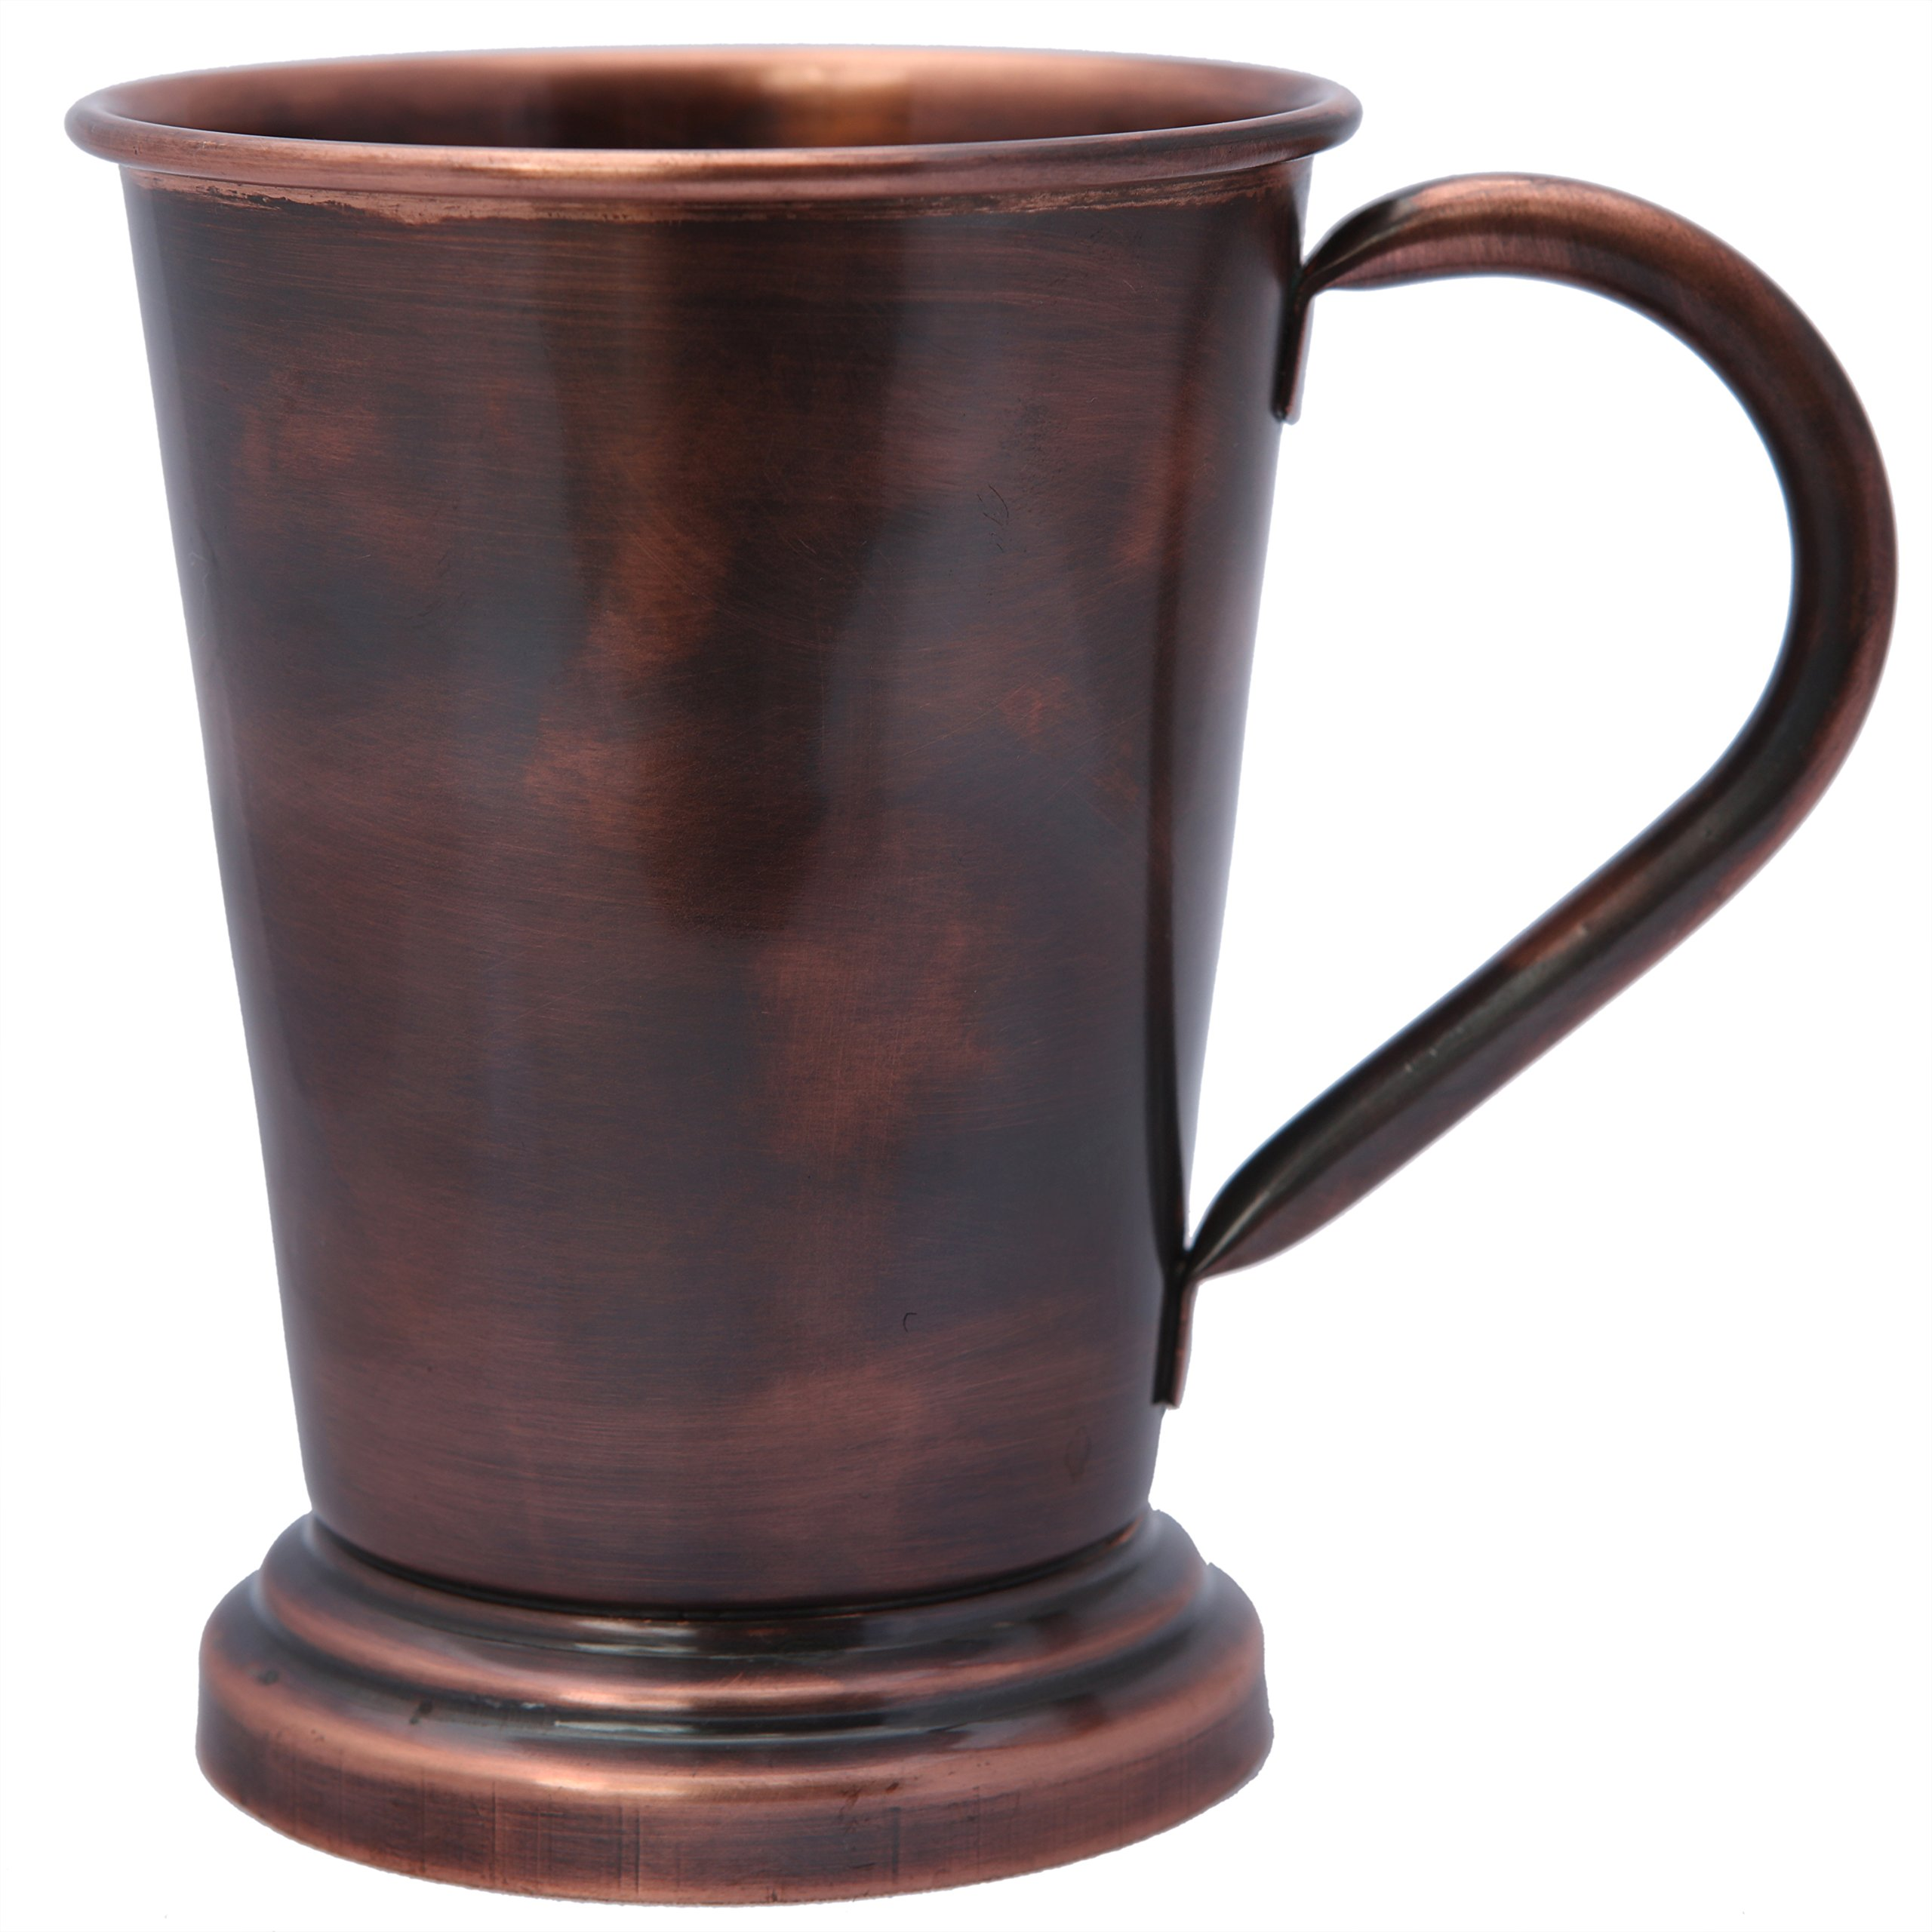 Melange 100% Authentic Copper Artisan Collection Moscow Mule Mug, Antique Finish, Size-16 Oz, Set of 12 Mugs